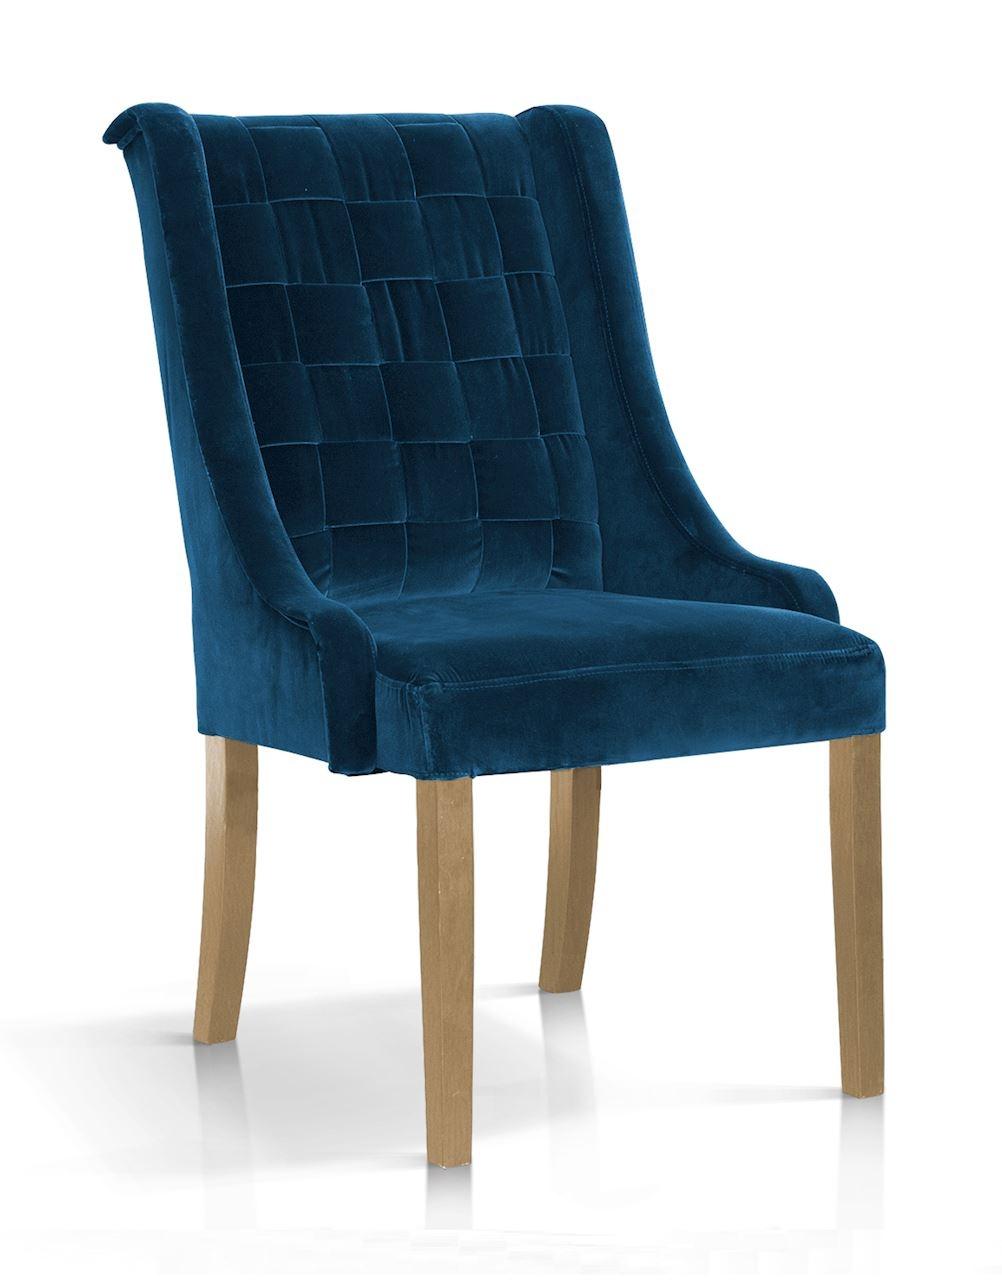 Scaun tapitat cu stofa, cu picioare din lemn Prince Velvet Bleumarin / Stejar, l55xA70xH105 cm somproduct.ro